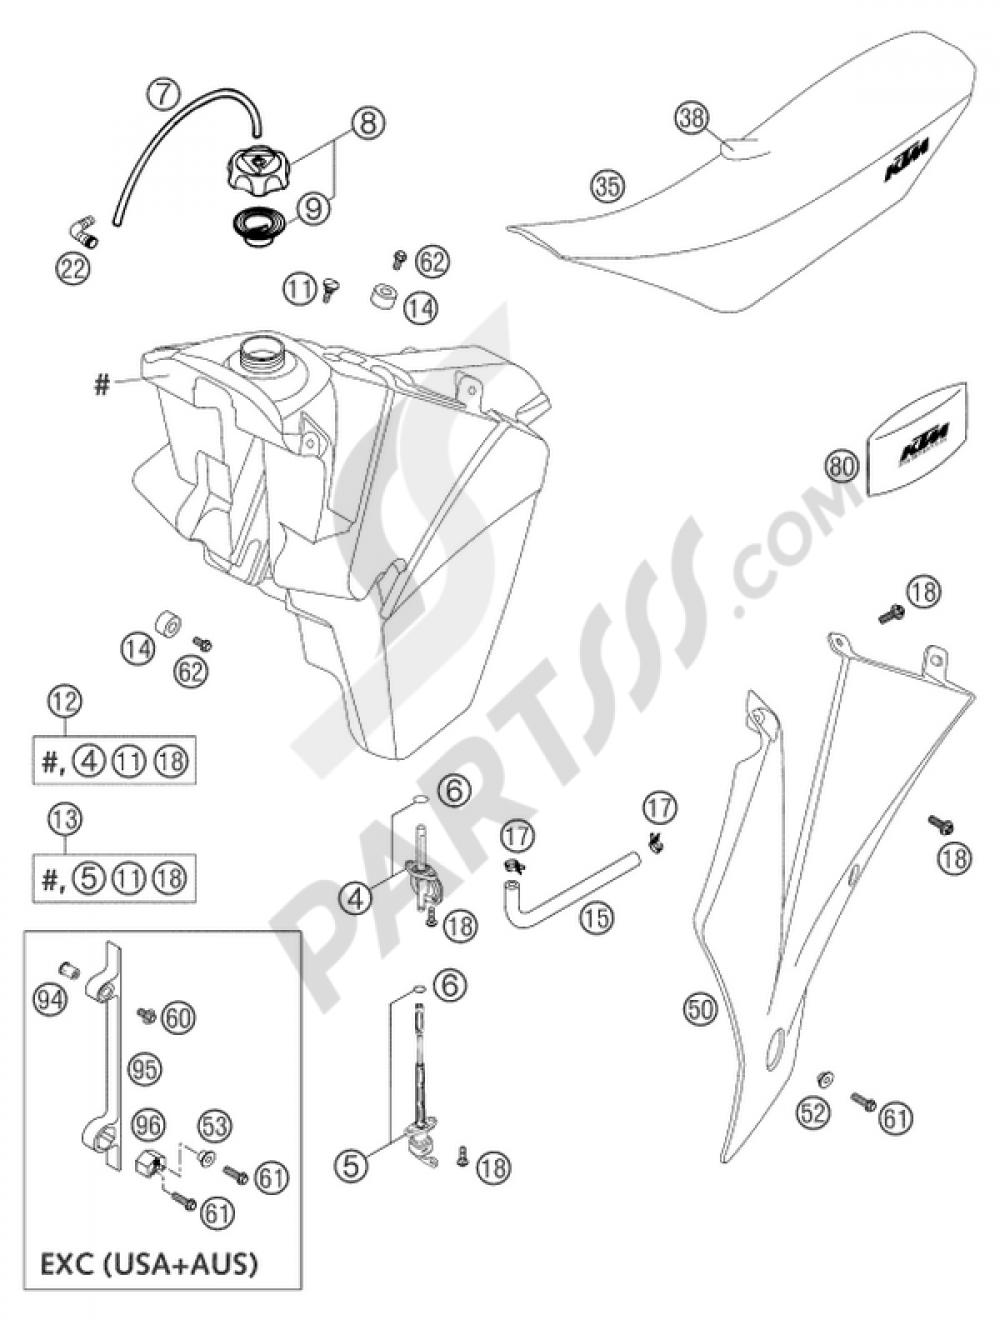 hight resolution of 2003 ktm 125 sx wiring diagram wiring schematic diagram 190 wiring diagram 2003 ktm 125sx